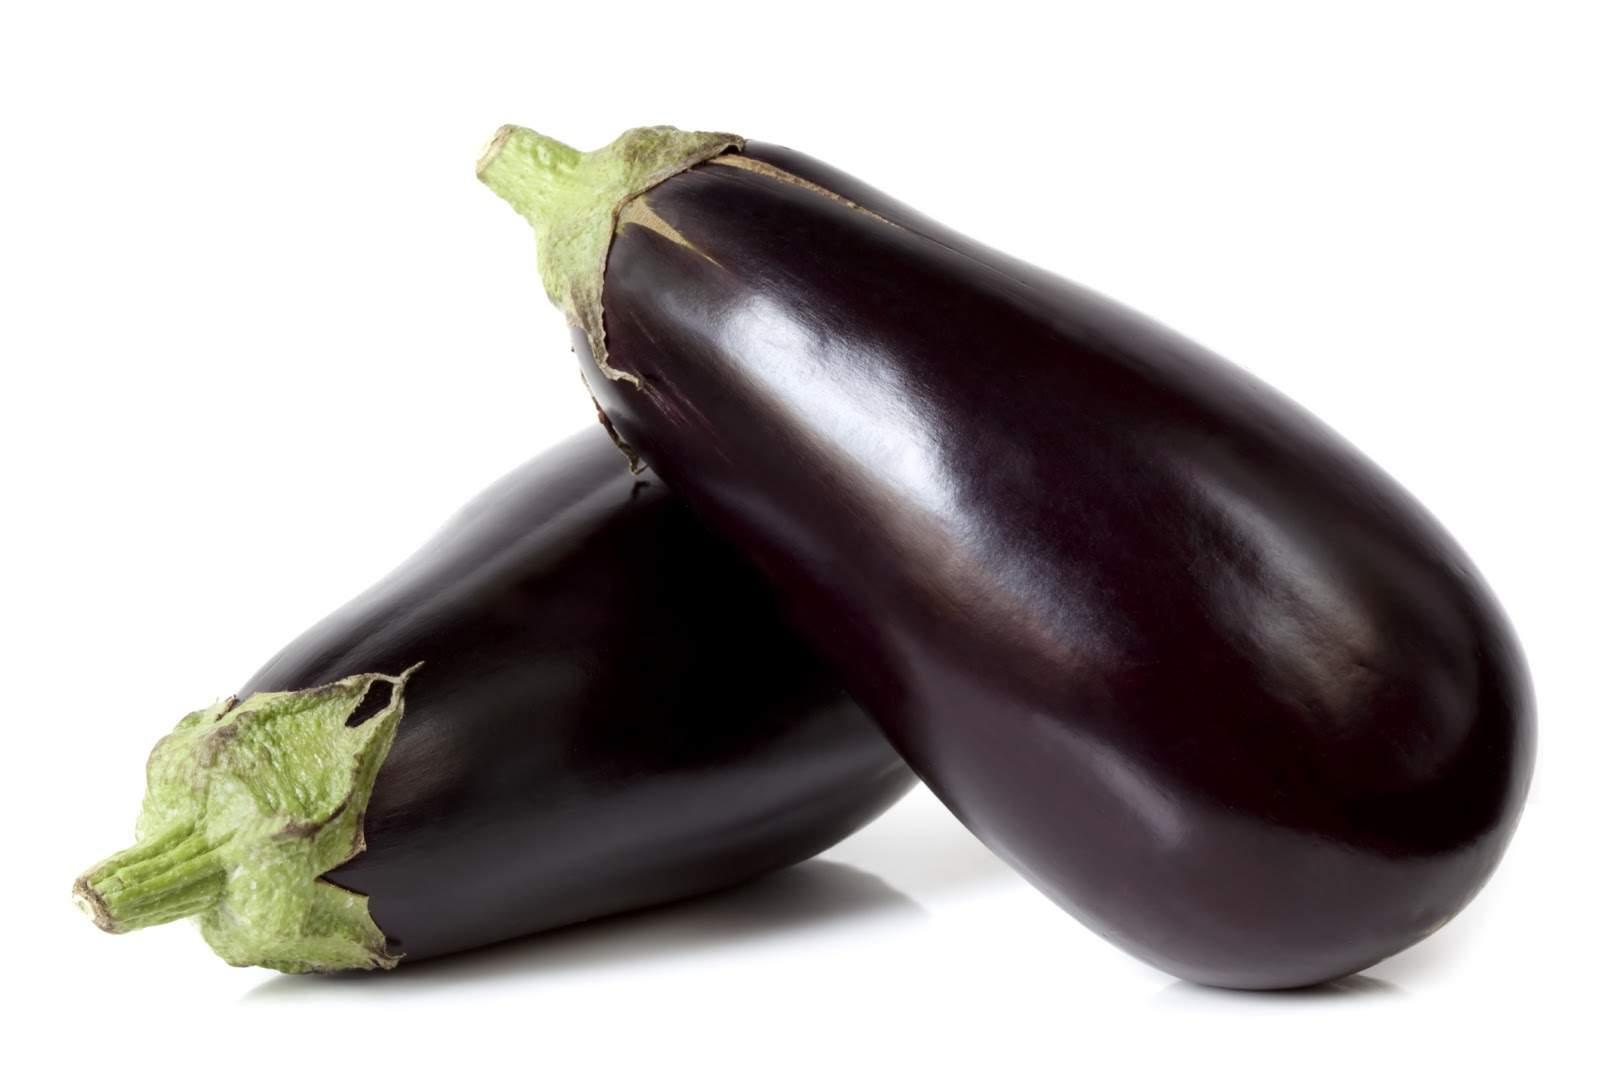 Eggplant – Black Globe Small LOCAL (Per LB/Approx 1LB)